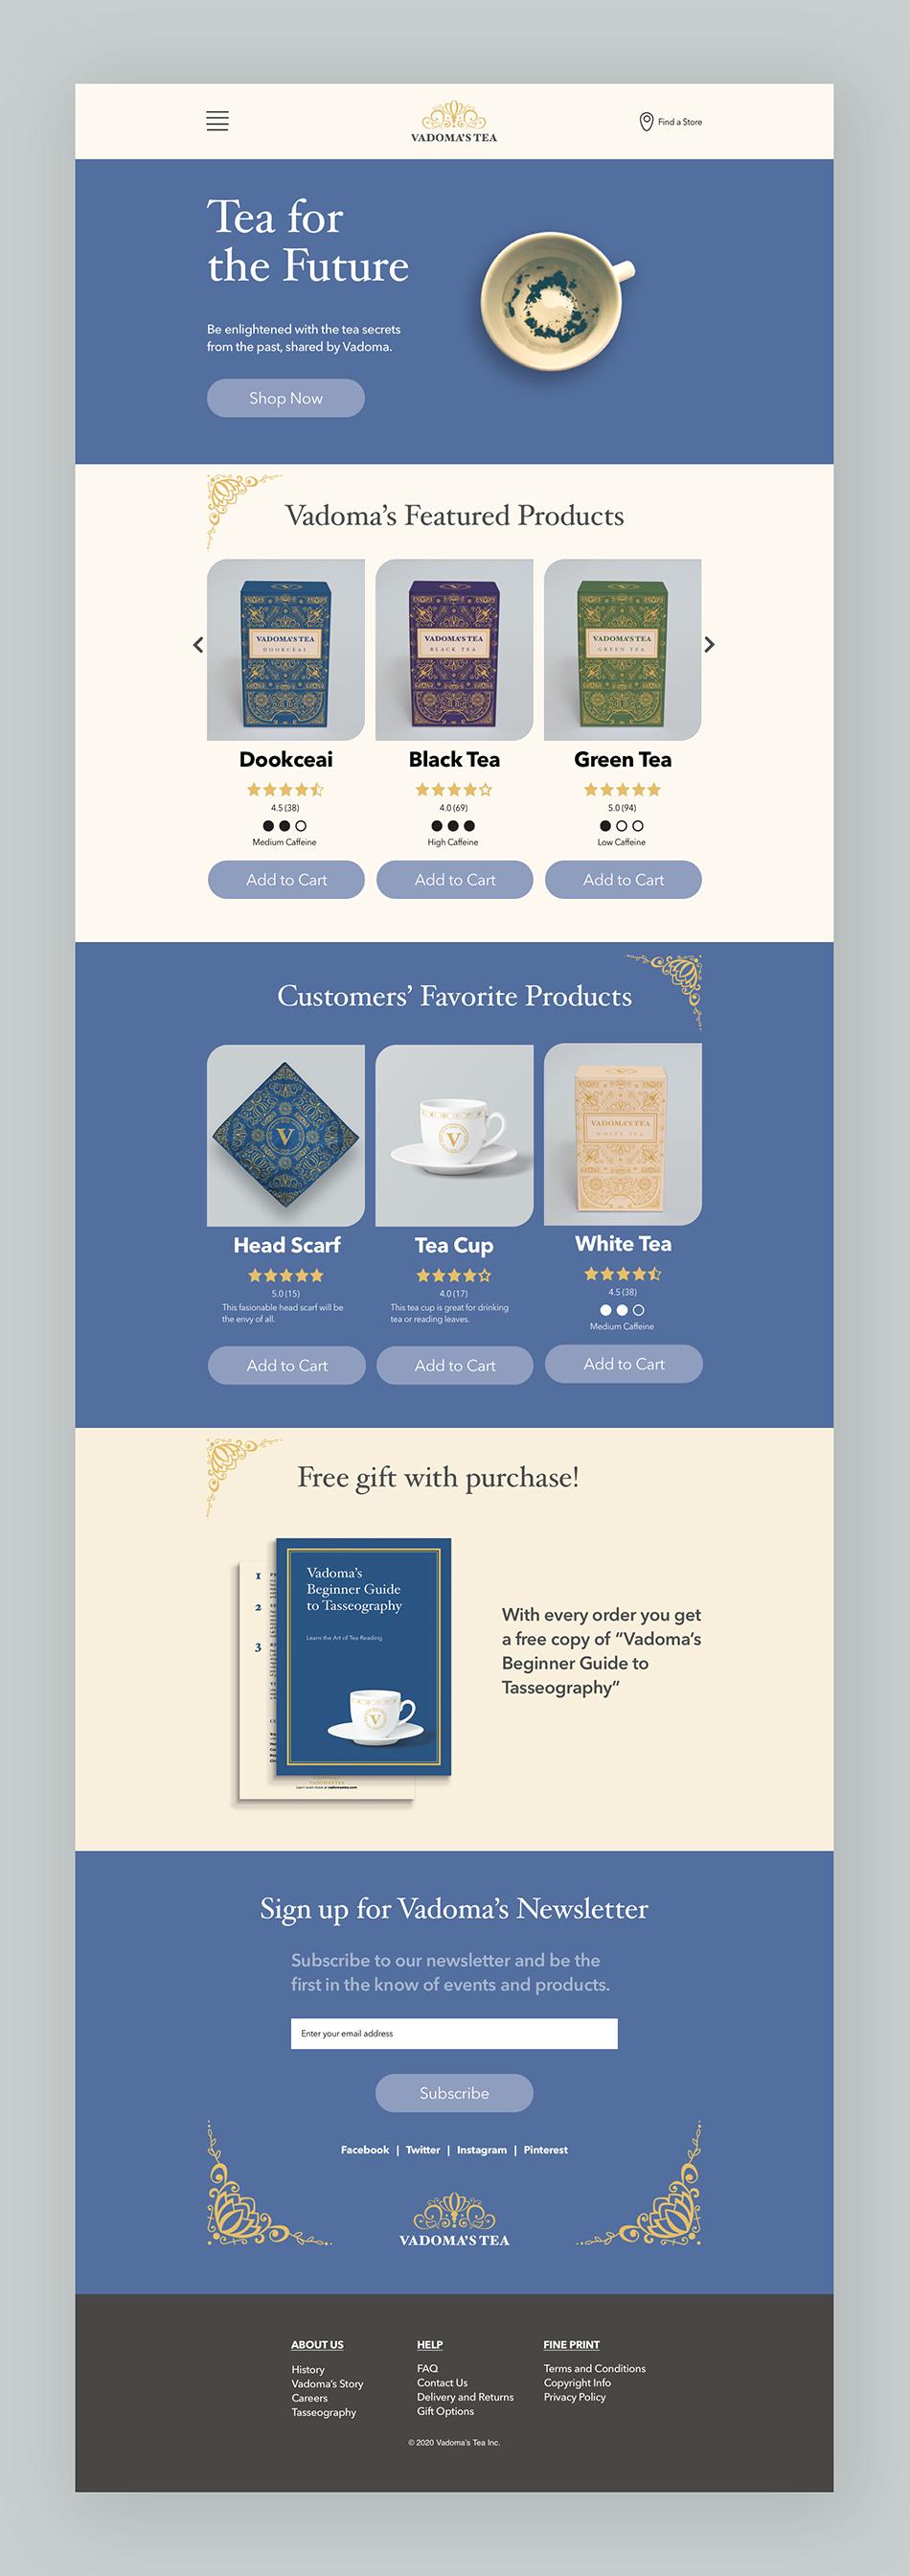 Vadoma's Tea Desktop version of the website